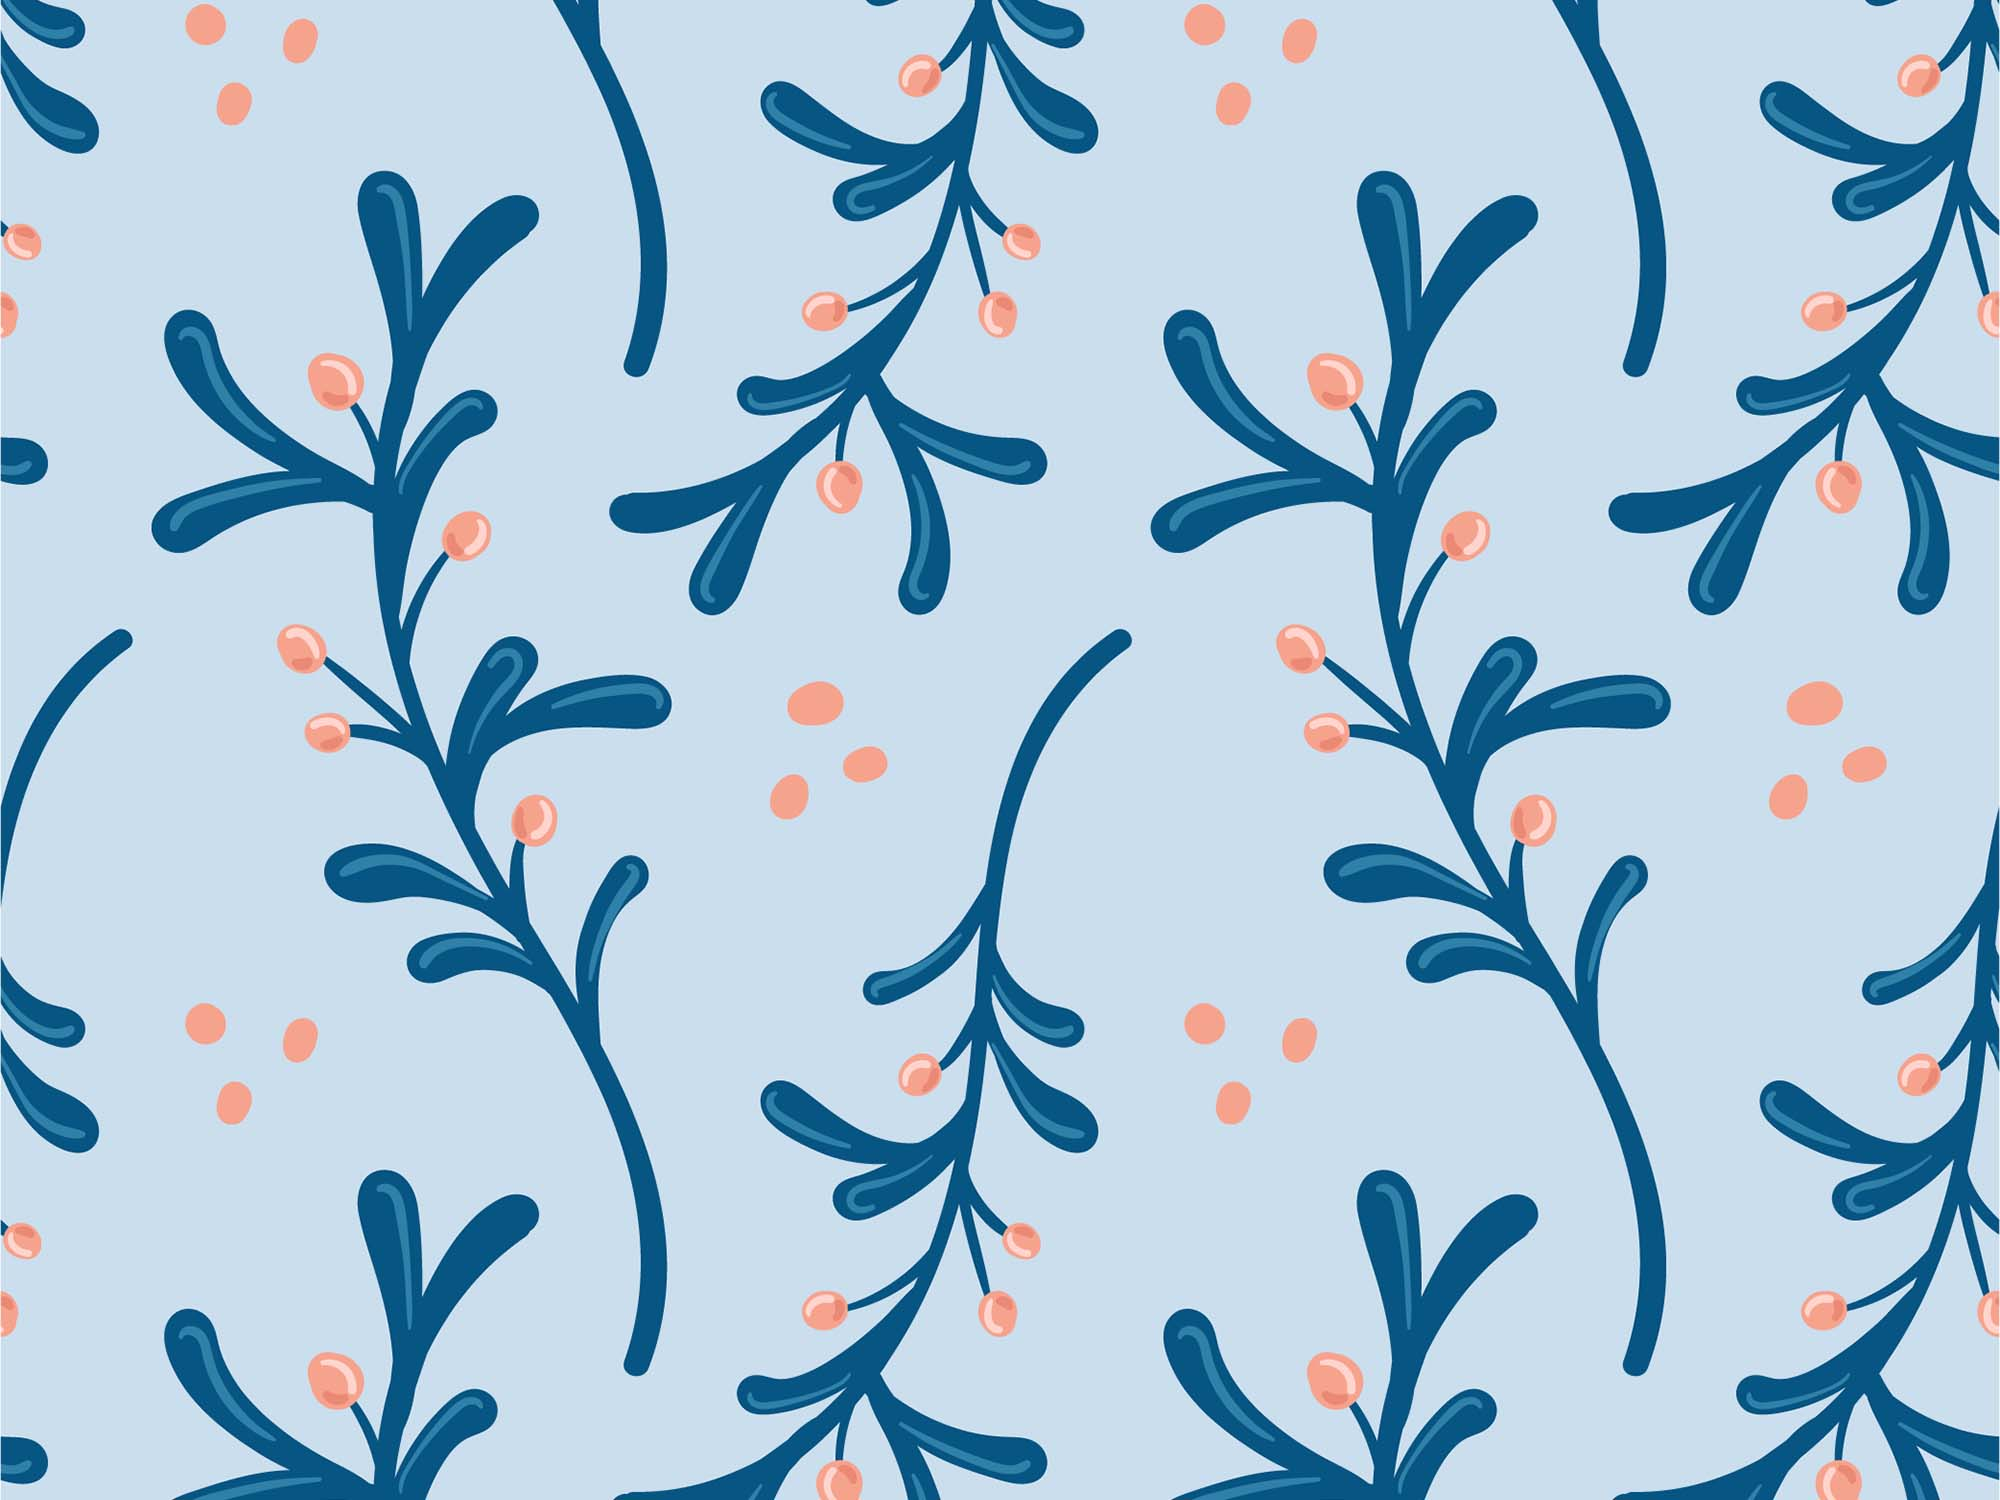 Floral Vector Patterns 8